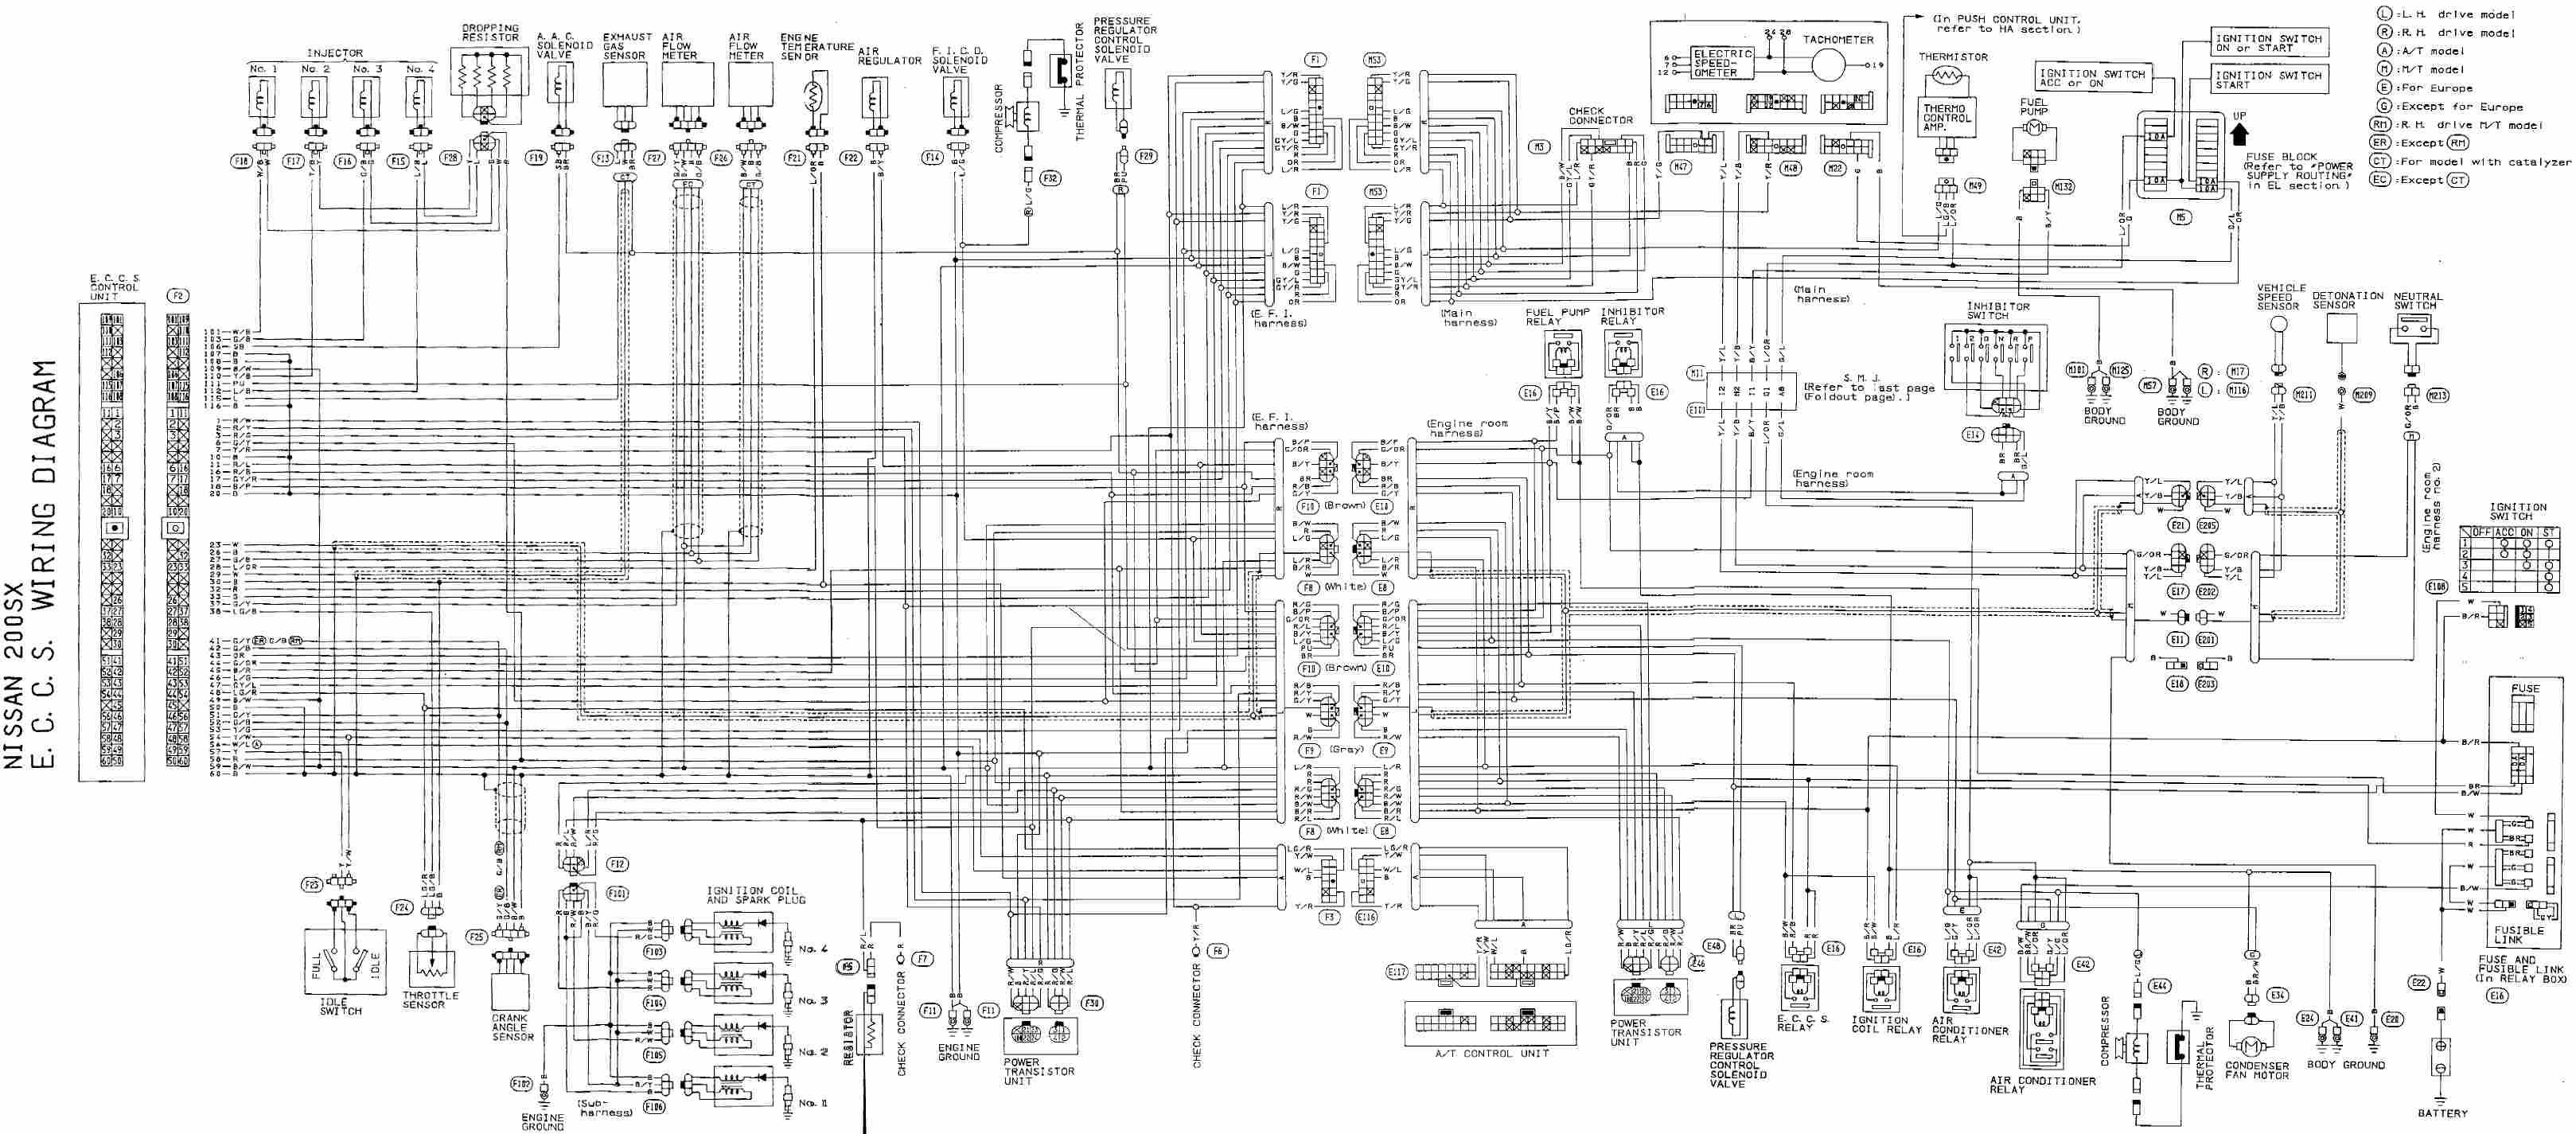 Diagram Wiring 1995 240sx